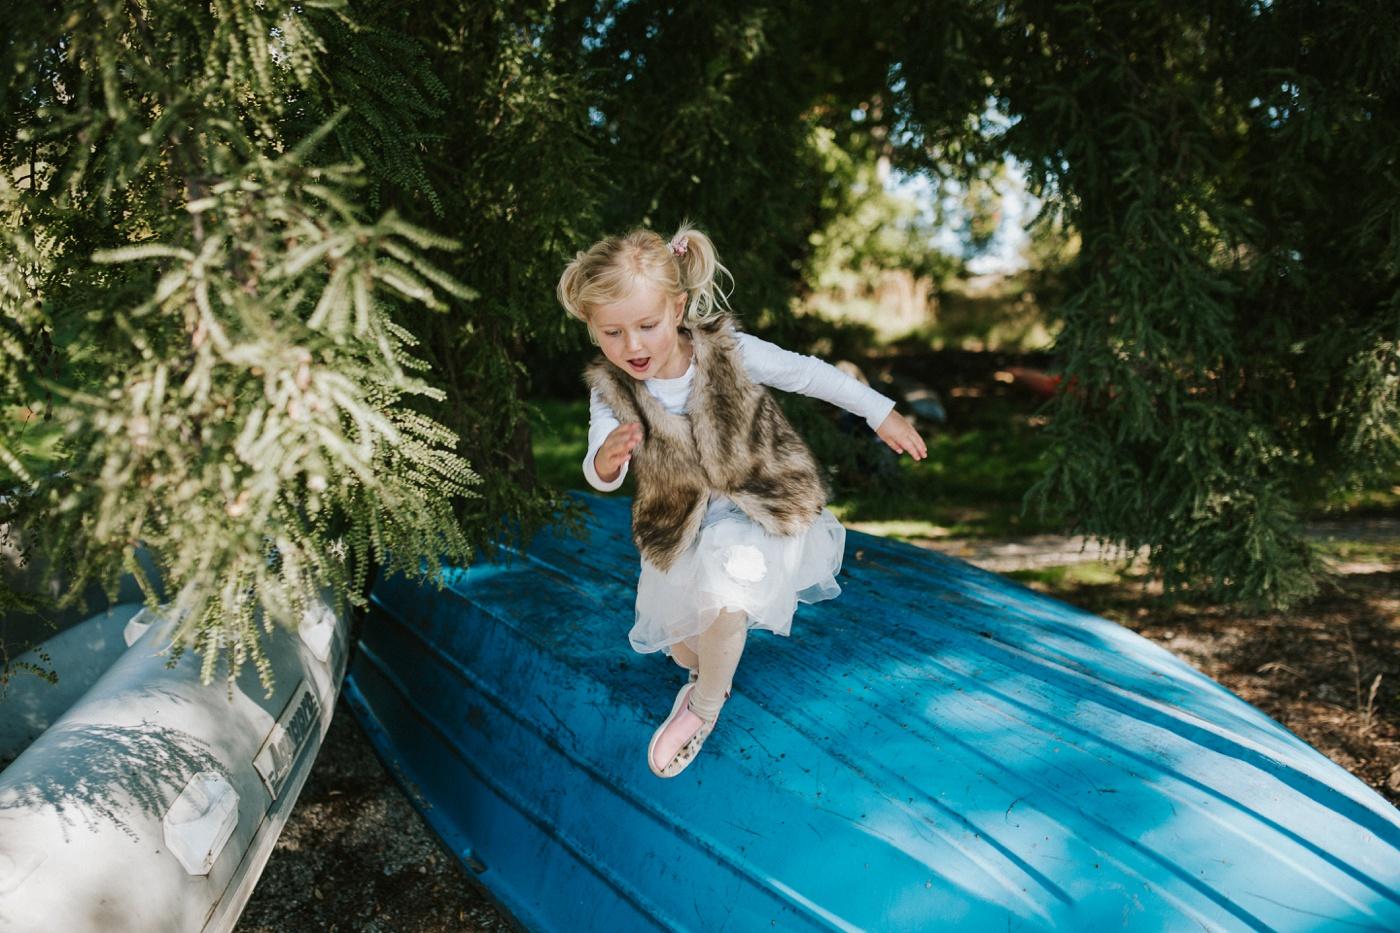 Blake-Lily-Rolig-Lekfull-Familjesession-Familjefotograf-Stockholm-Orebro_29